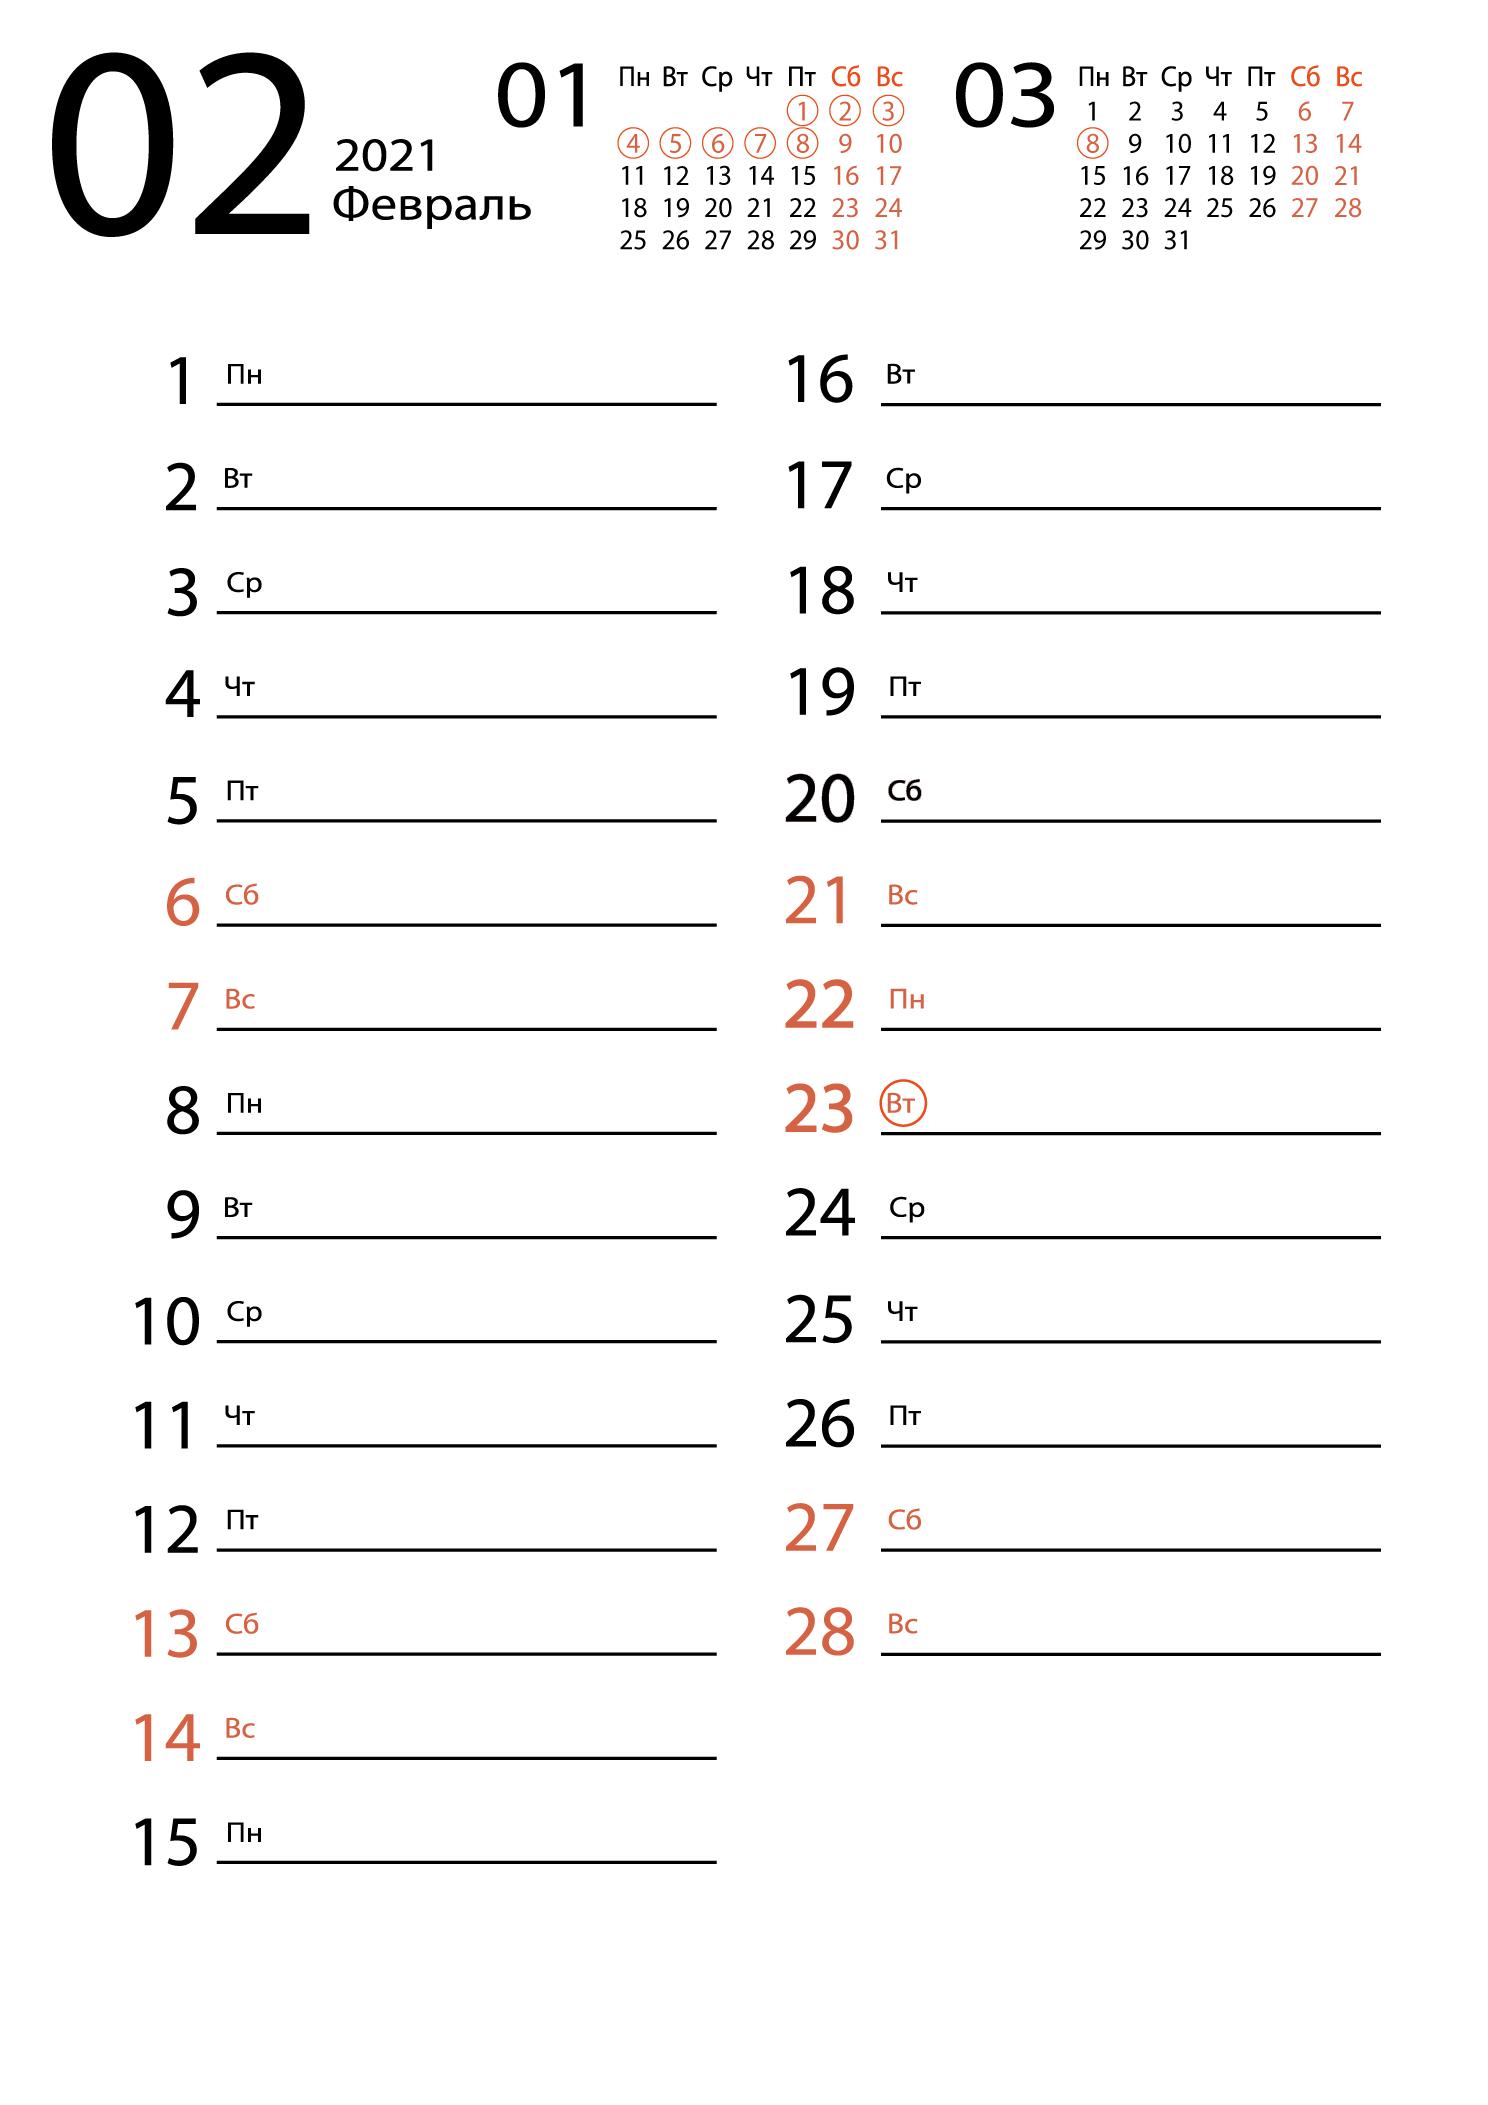 Календарь на февраль 2021 (для заметок)